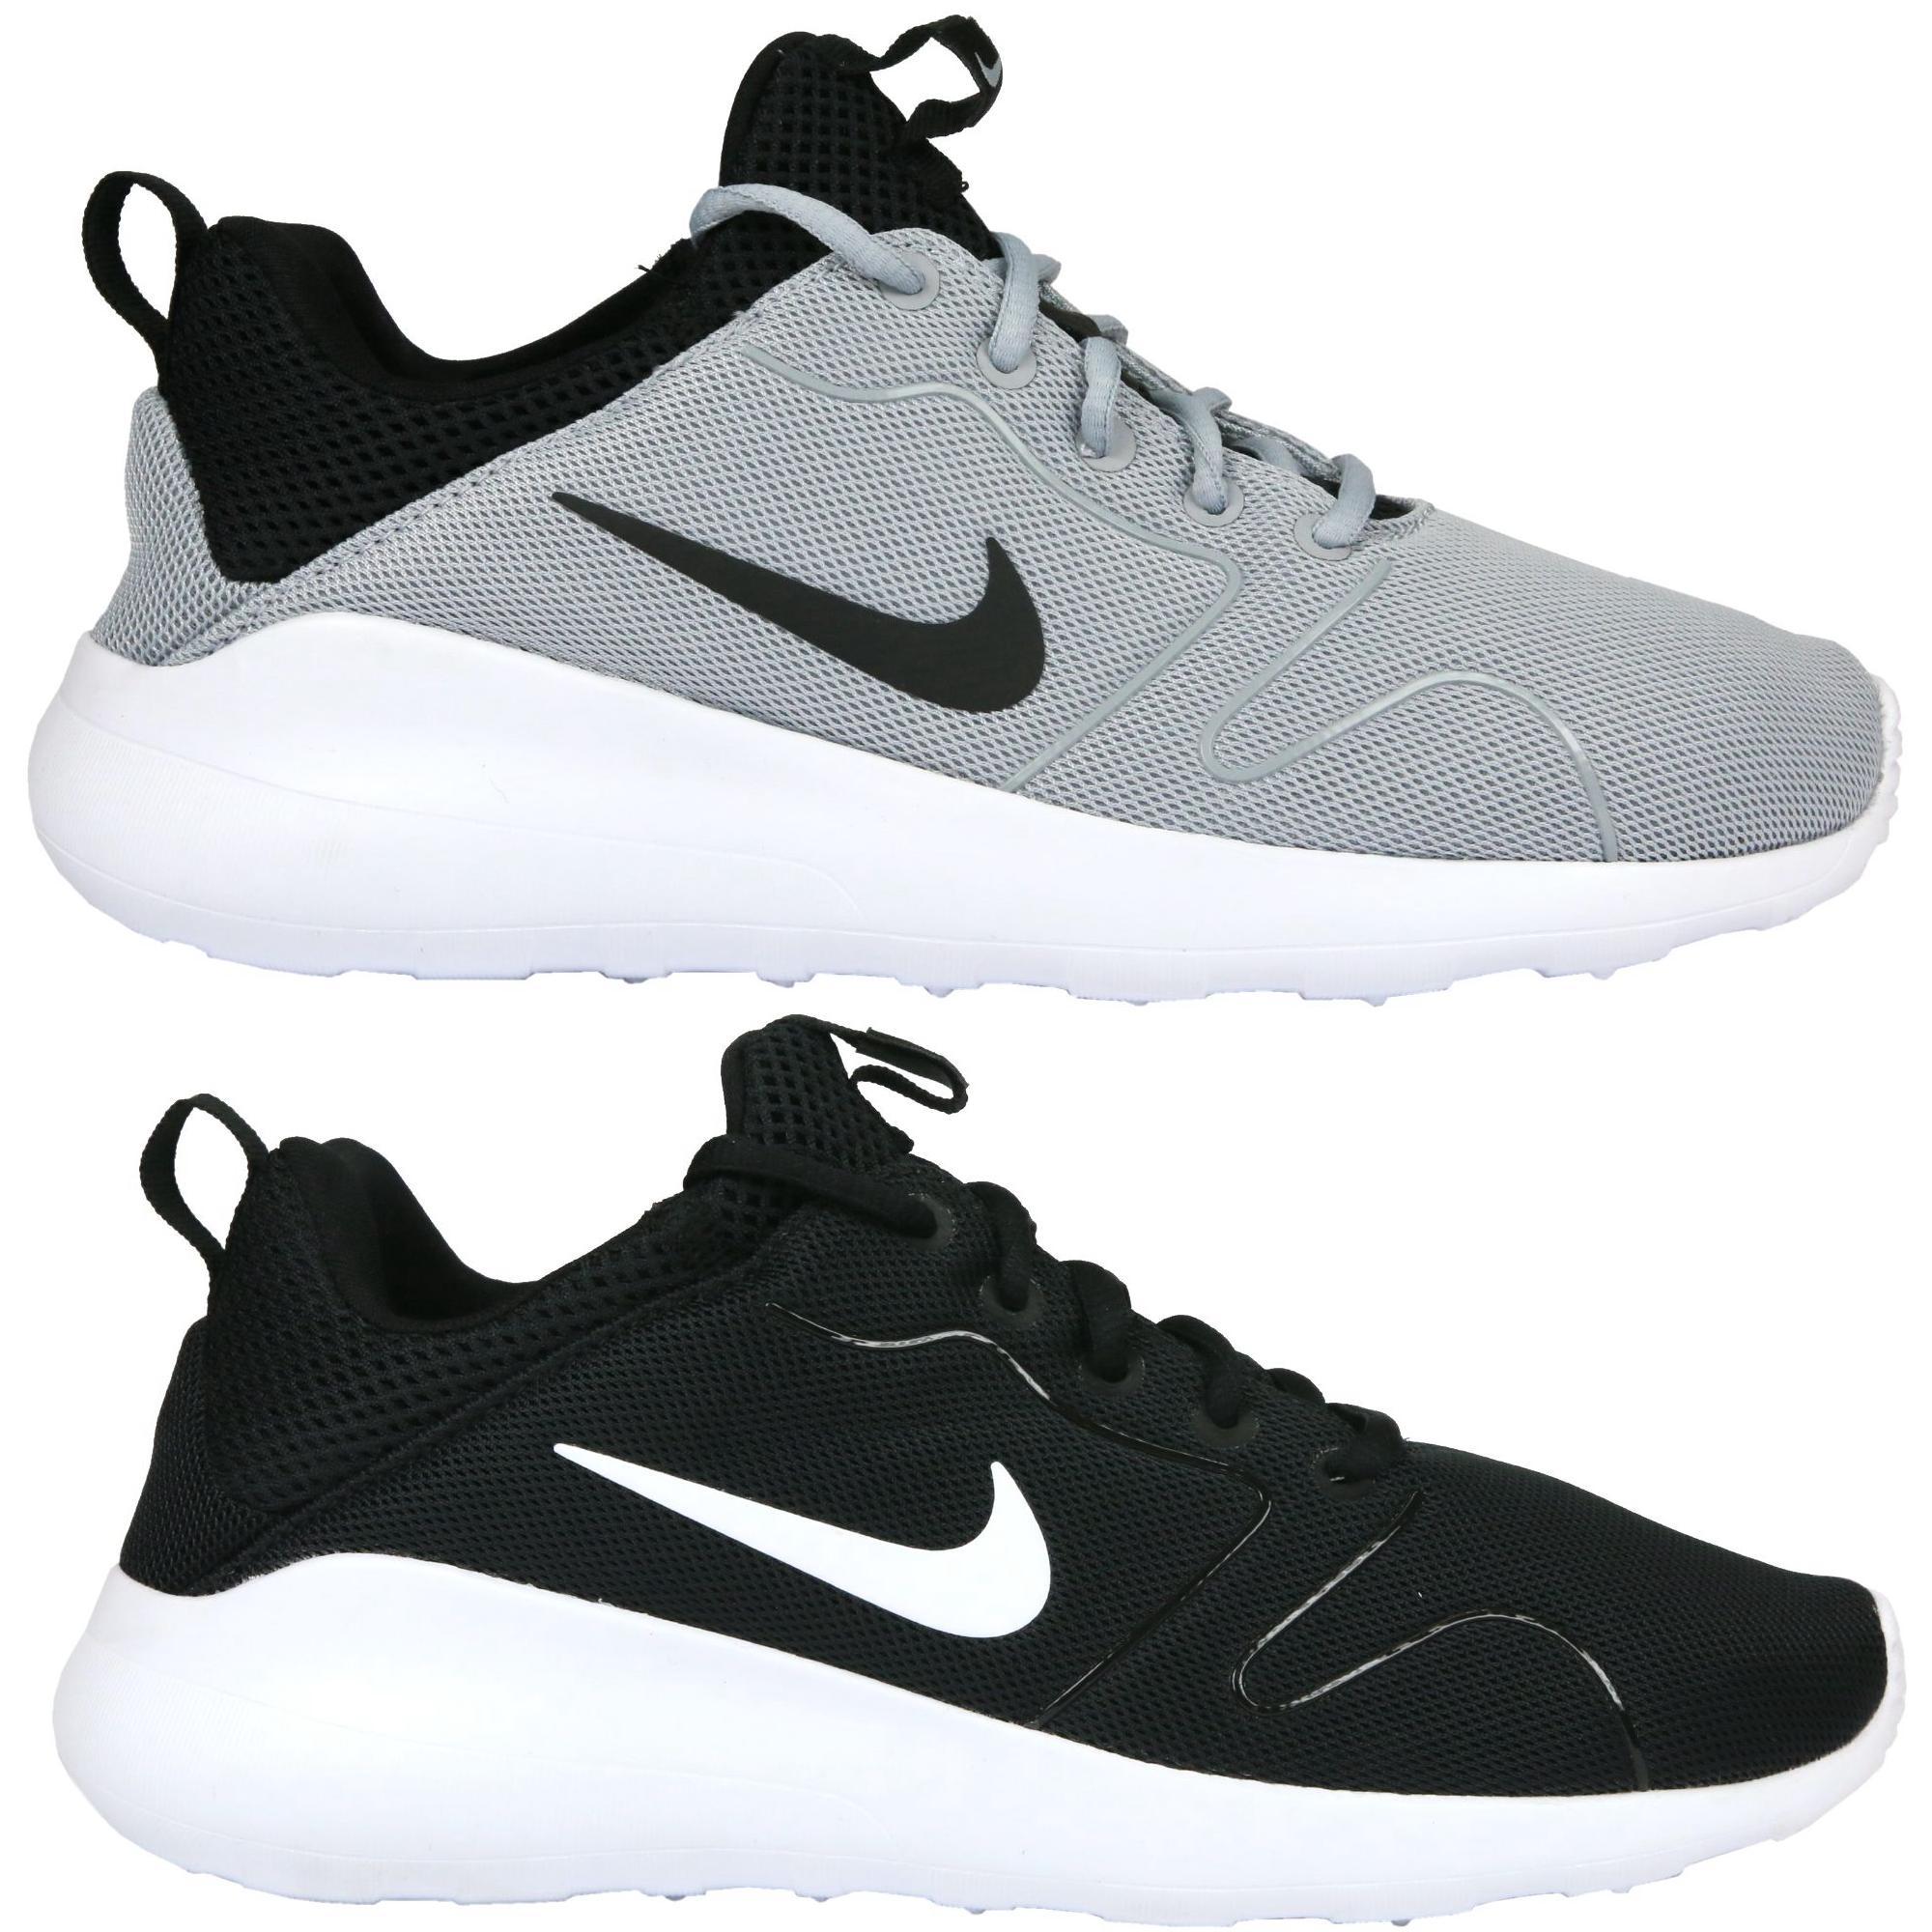 Nike Kaishi 2 0 Schuhe Turnschuhe Sneaker Herren 833411 400 Blau